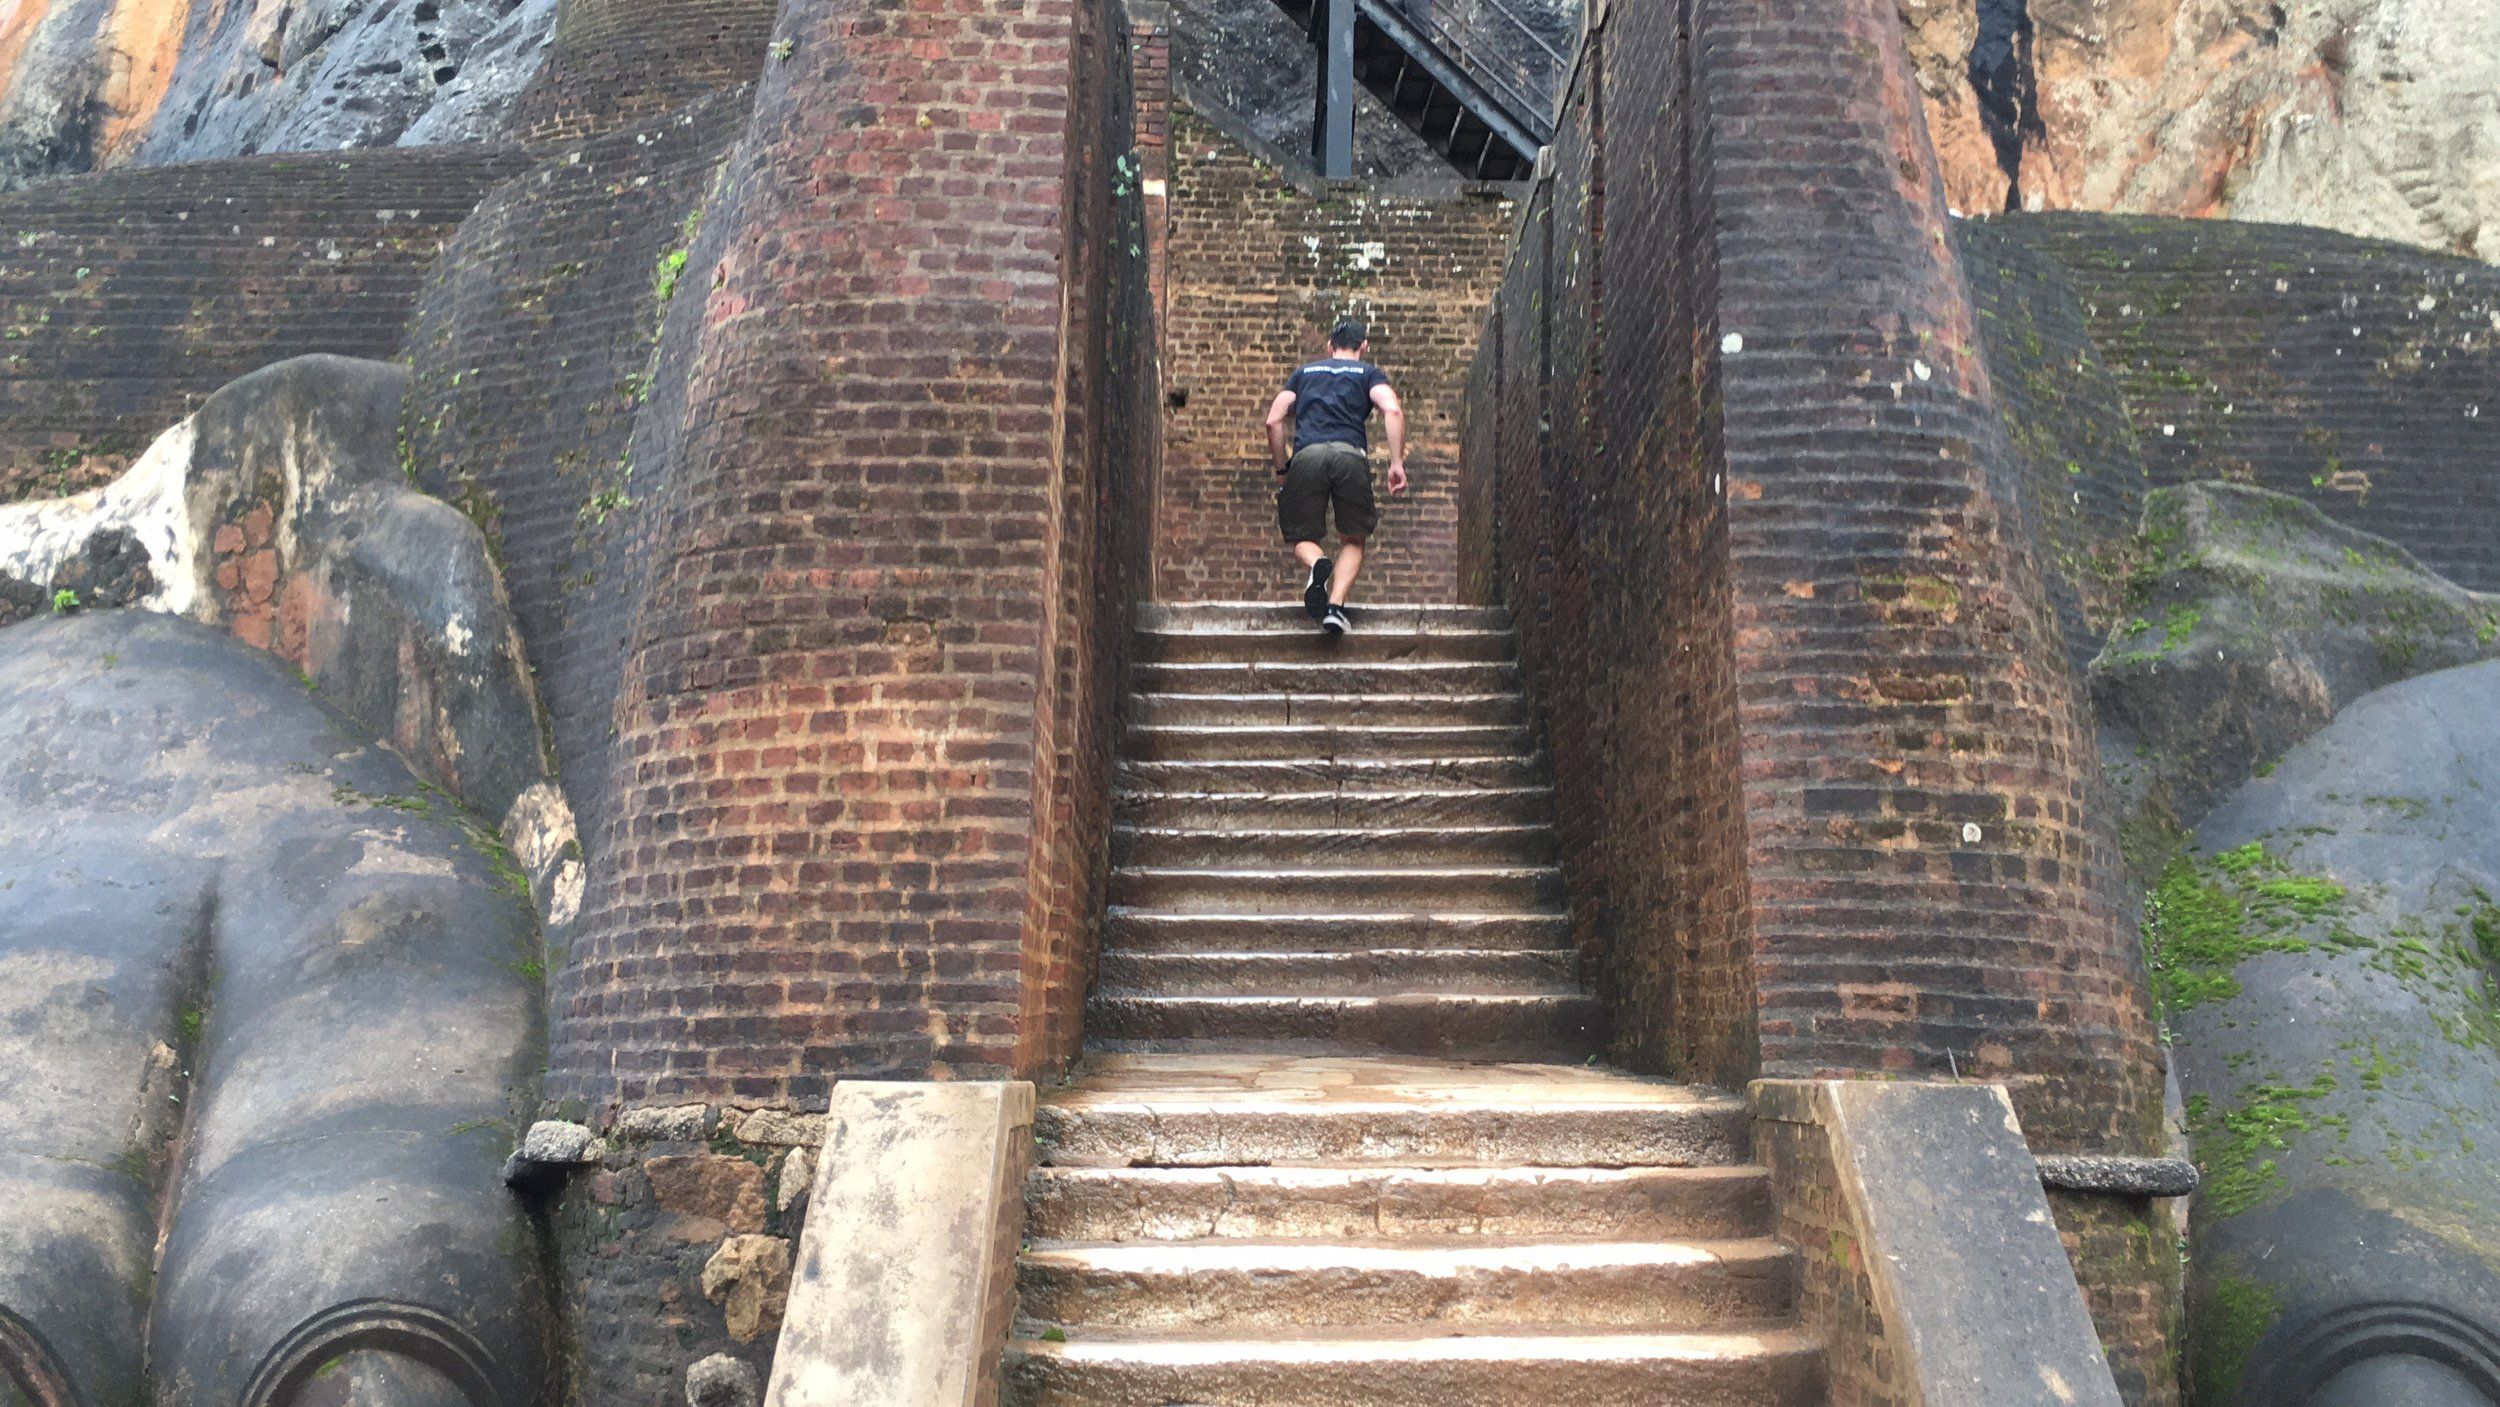 The entrance to the ancient Citadel of Sigiriya